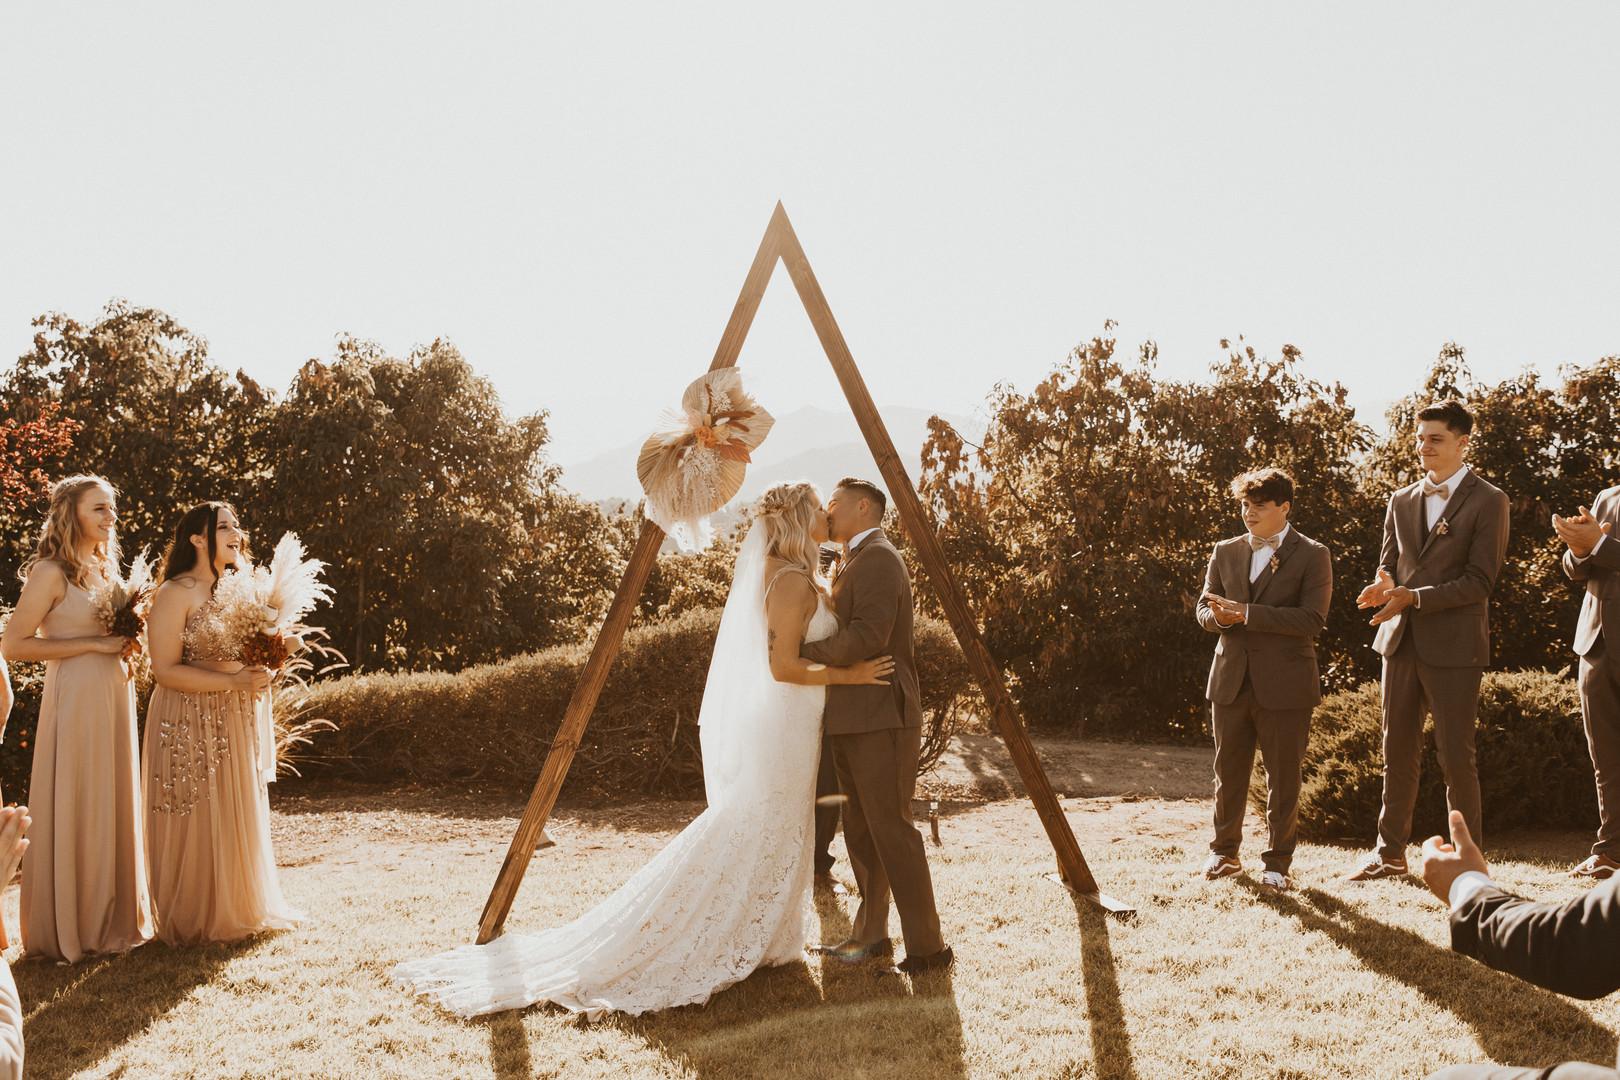 temecula wedding (33 of 59).jpg